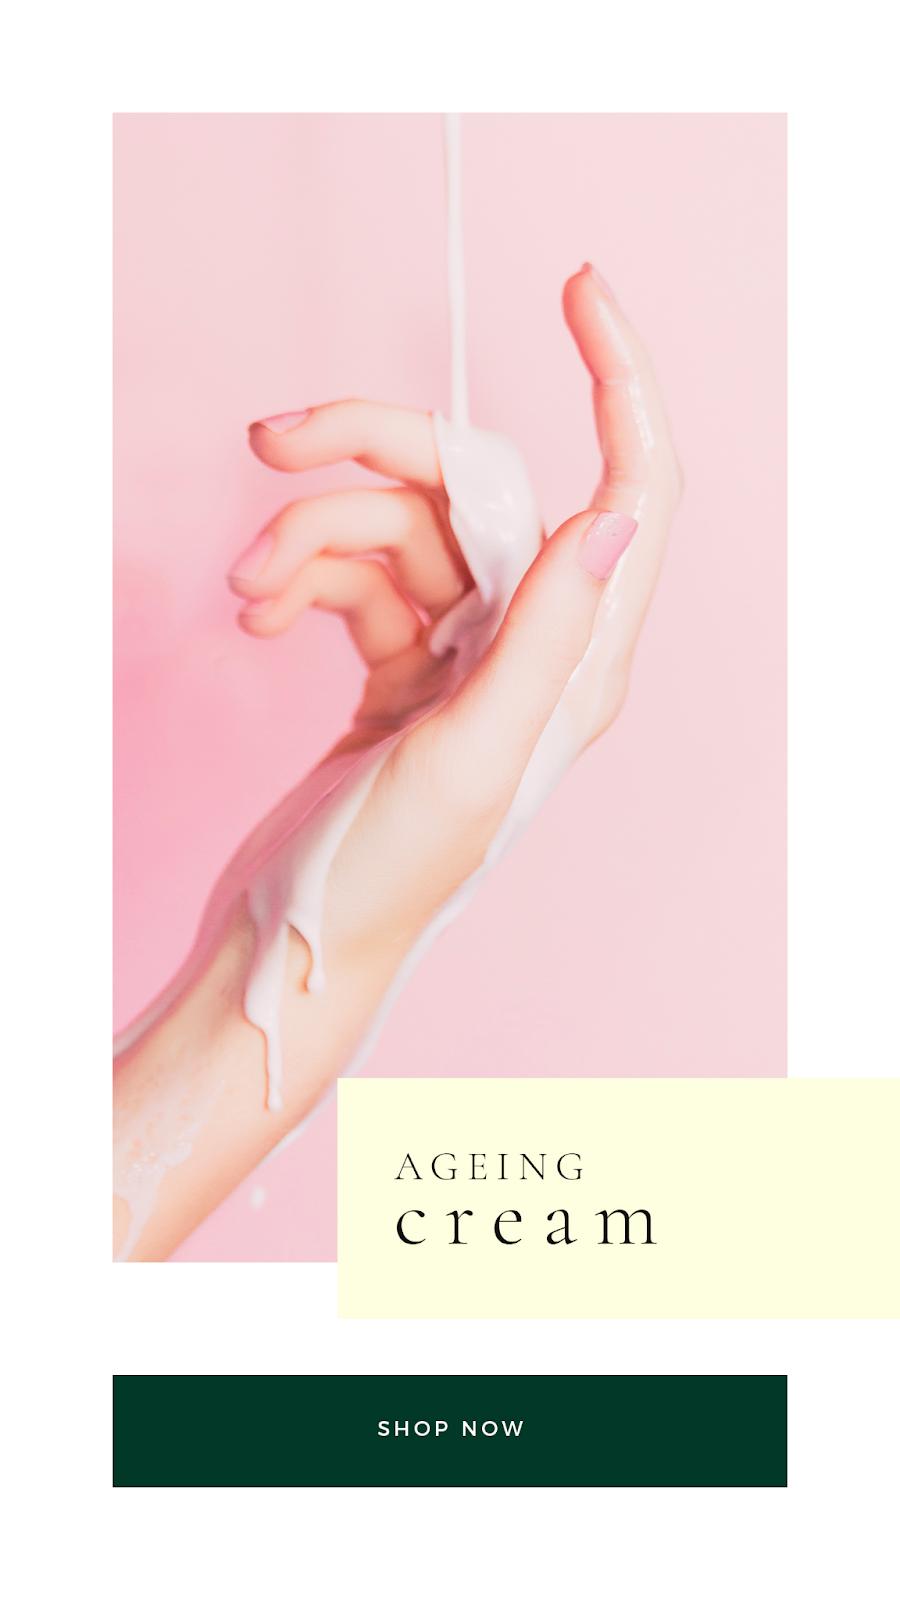 Graphics Eggs Ageing Cream Instagram Stories Templates